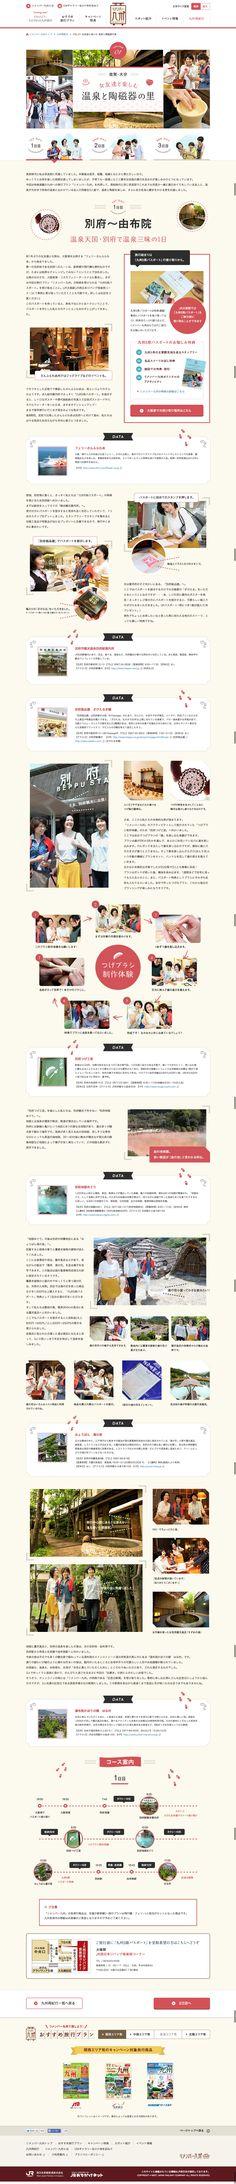 VOL.01 女友達と楽しむ 温泉と陶磁器の里|九州再紀行|リメンバー九州 懐かしく、新しい風景へ~いつかの場所が、新しい想い出になっていく。~ http://sanyo-kyushu.jp/course/vol01/